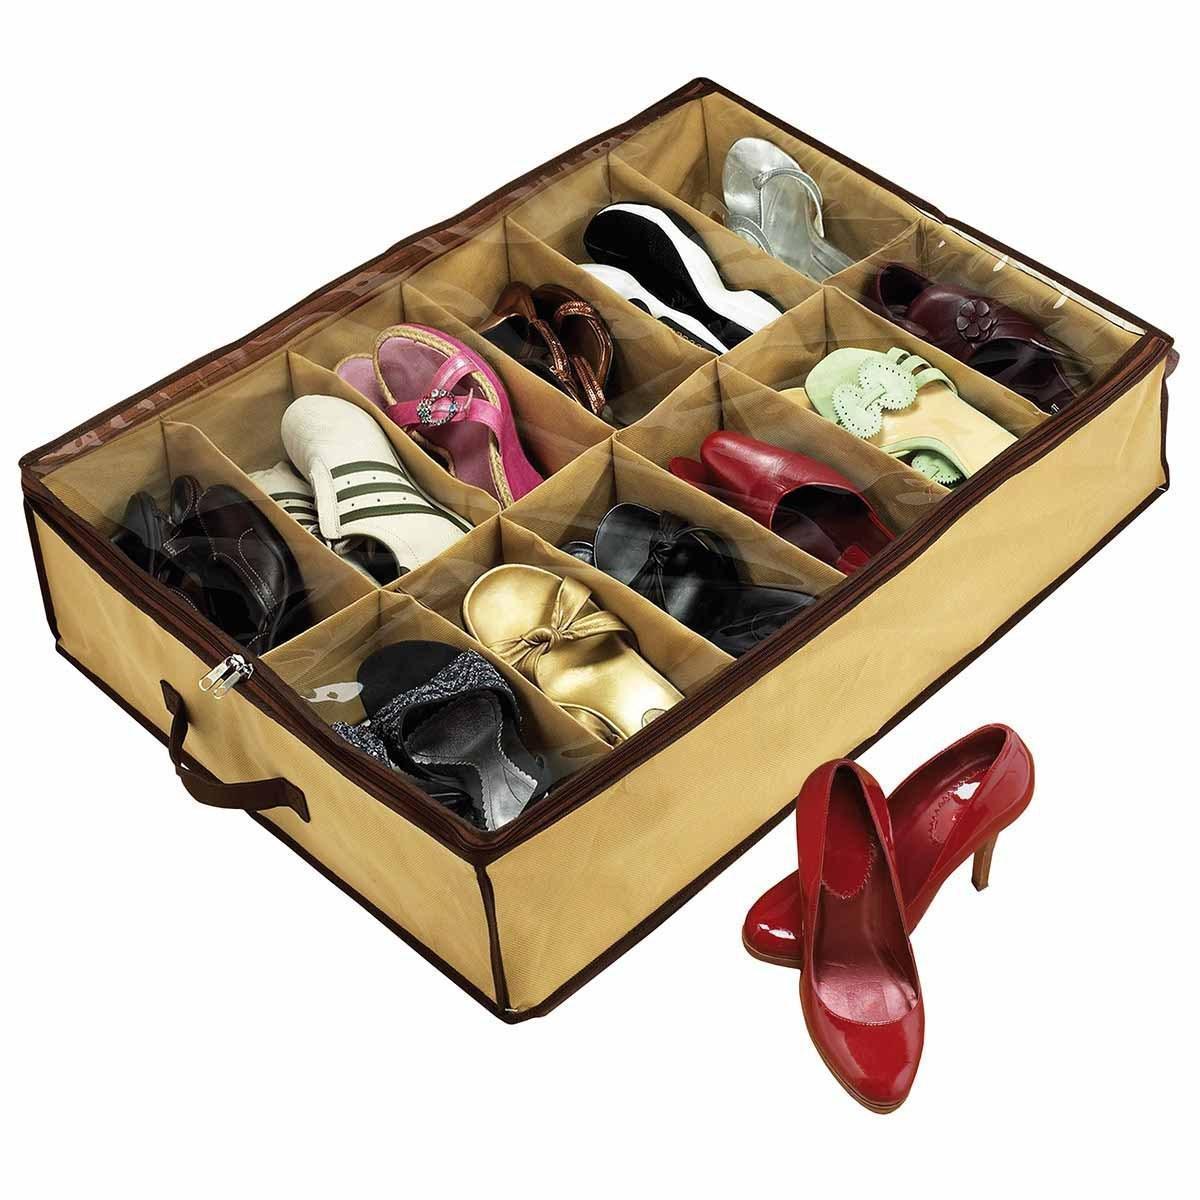 Організатор для взуття MHZ Shoes under